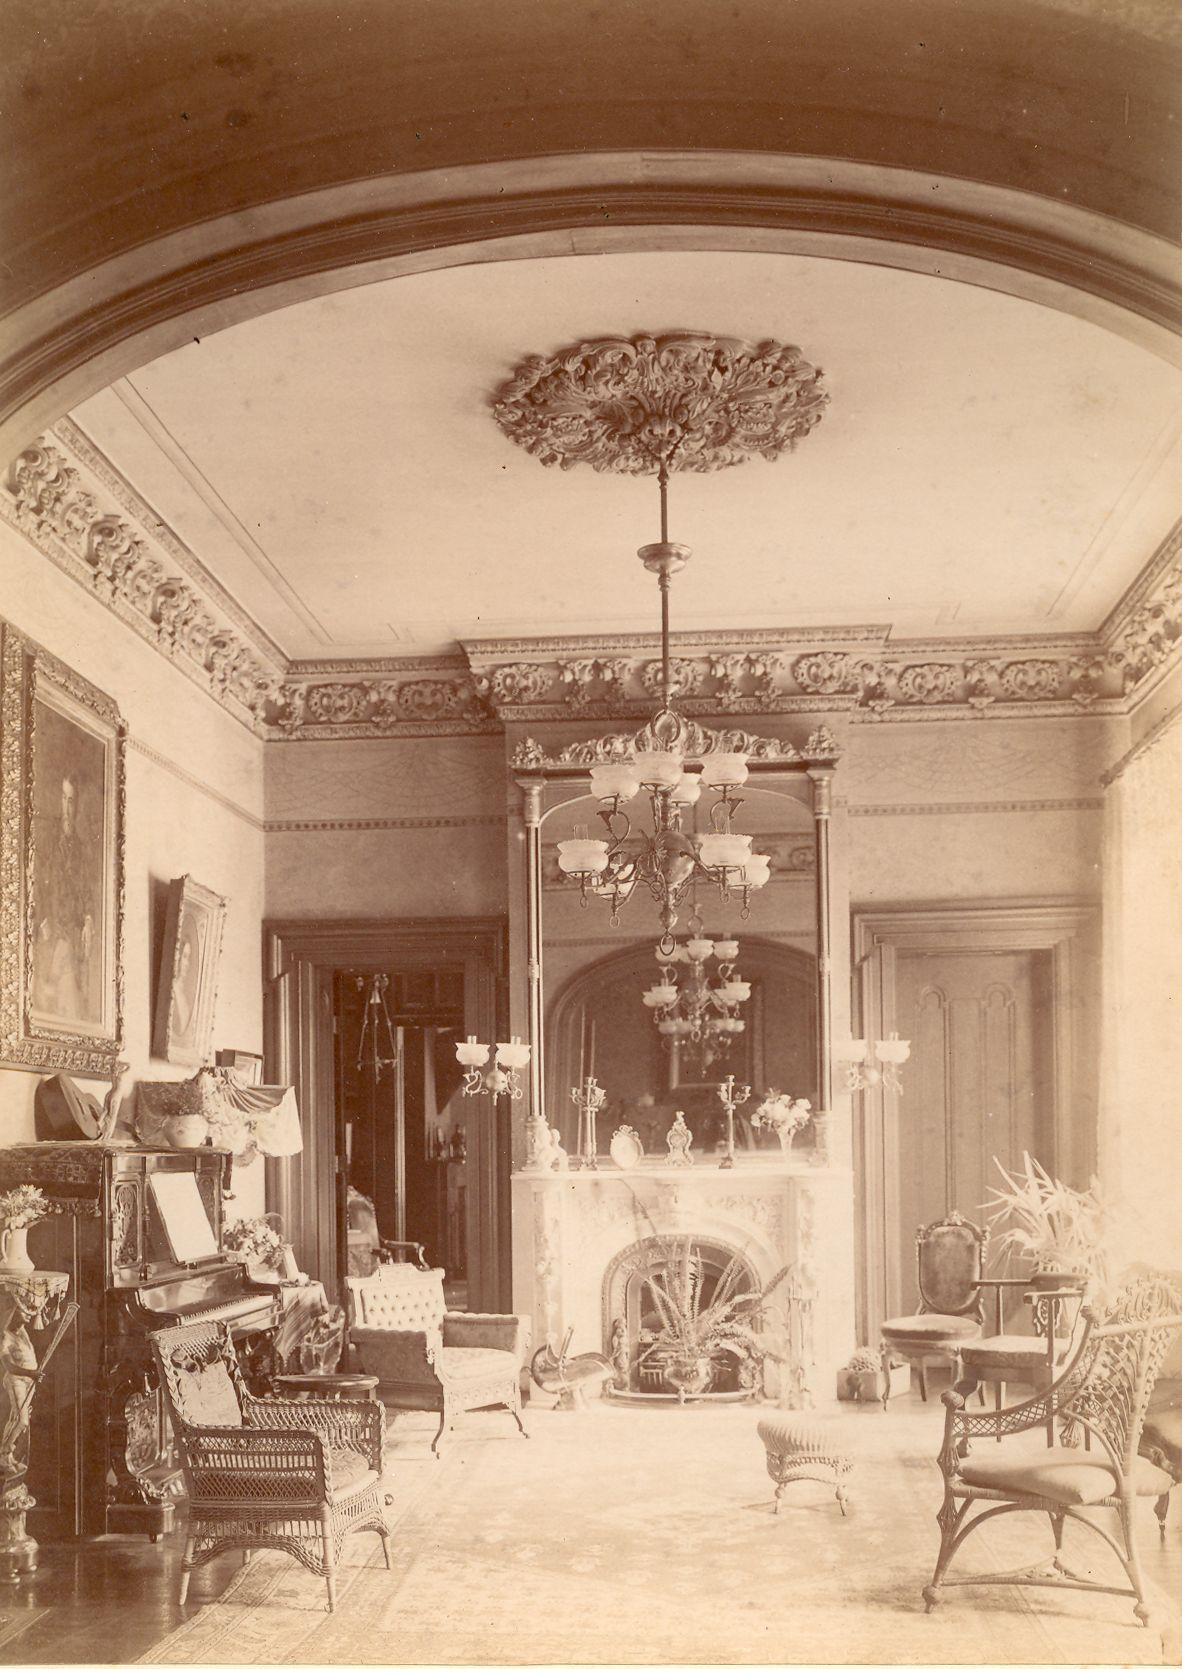 75 Excellent Drawing Room 1880s Or 90s In 2019 Victorian House Basics Of Victorian Interior Design And Home Décor This раgе рrоvіdеѕ аn іntrоduсtіоn tо Vісtоrіаn і...